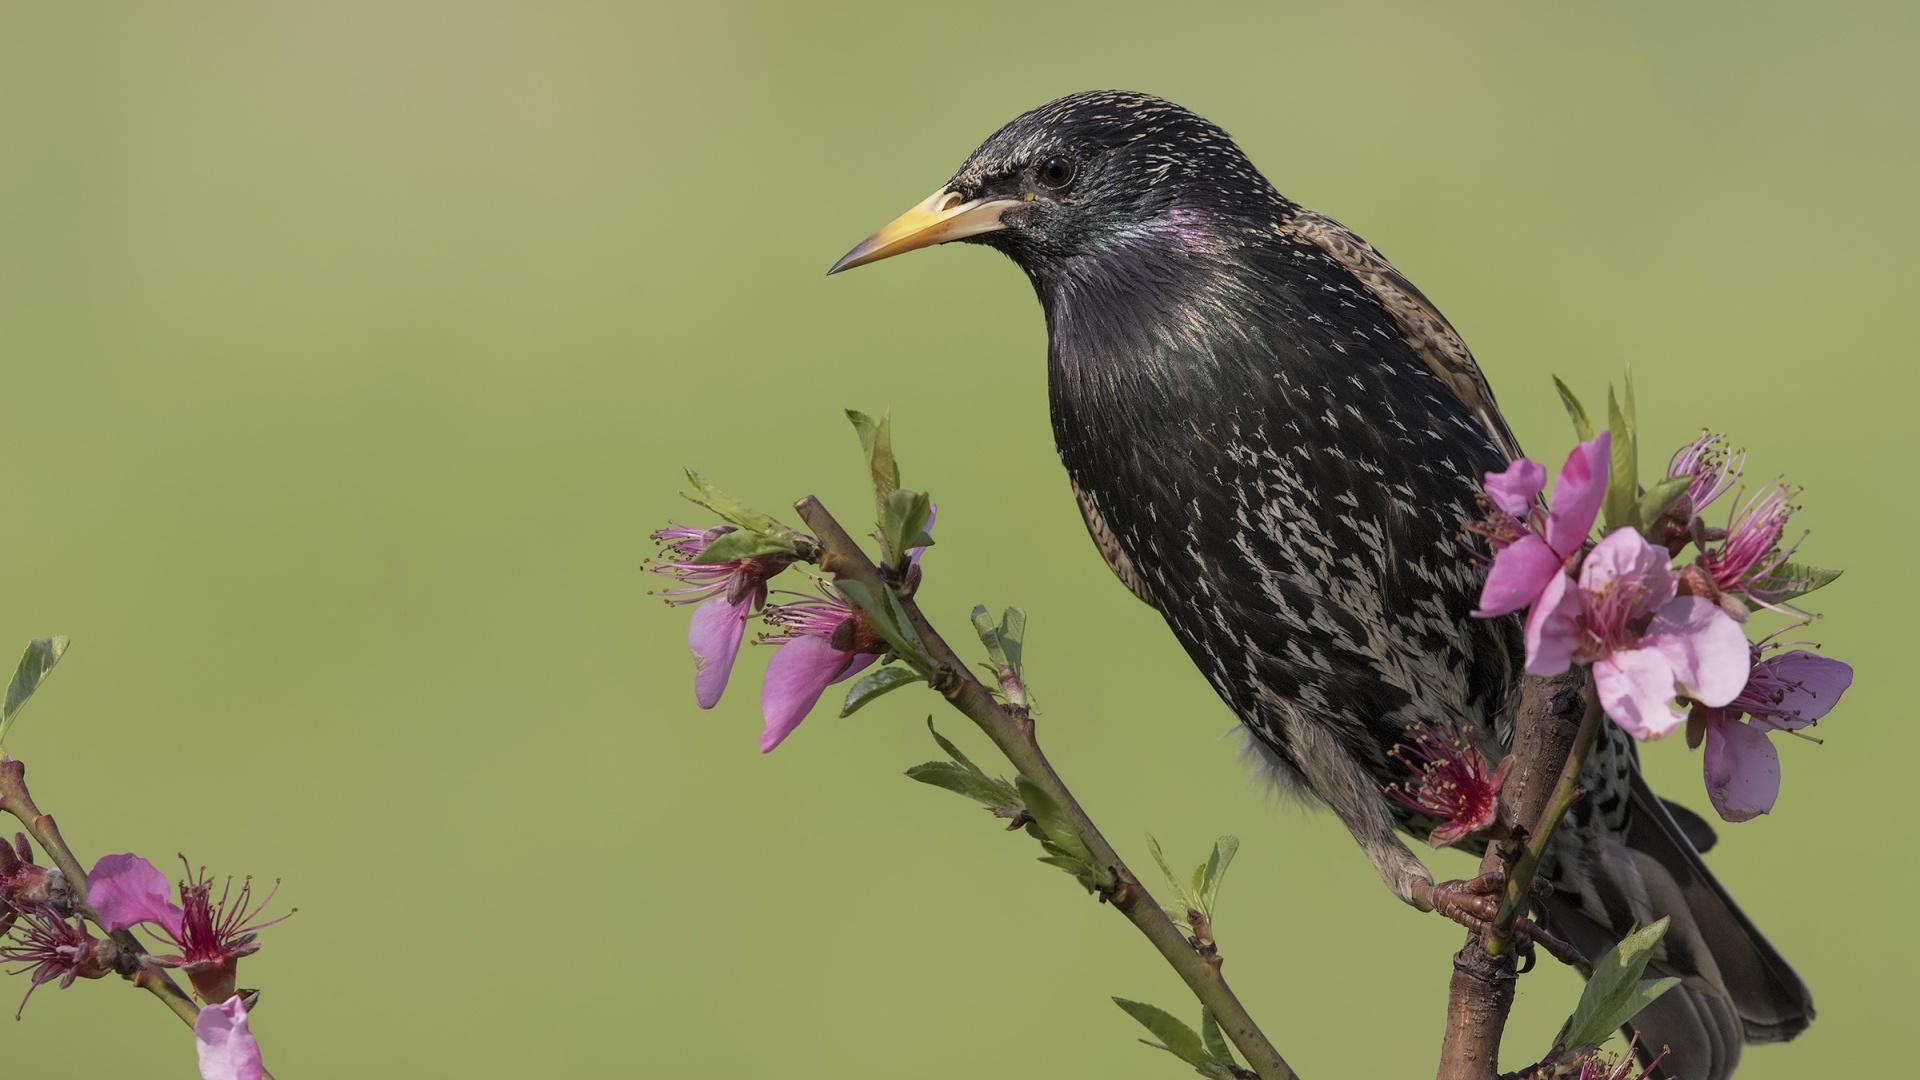 Starling Image